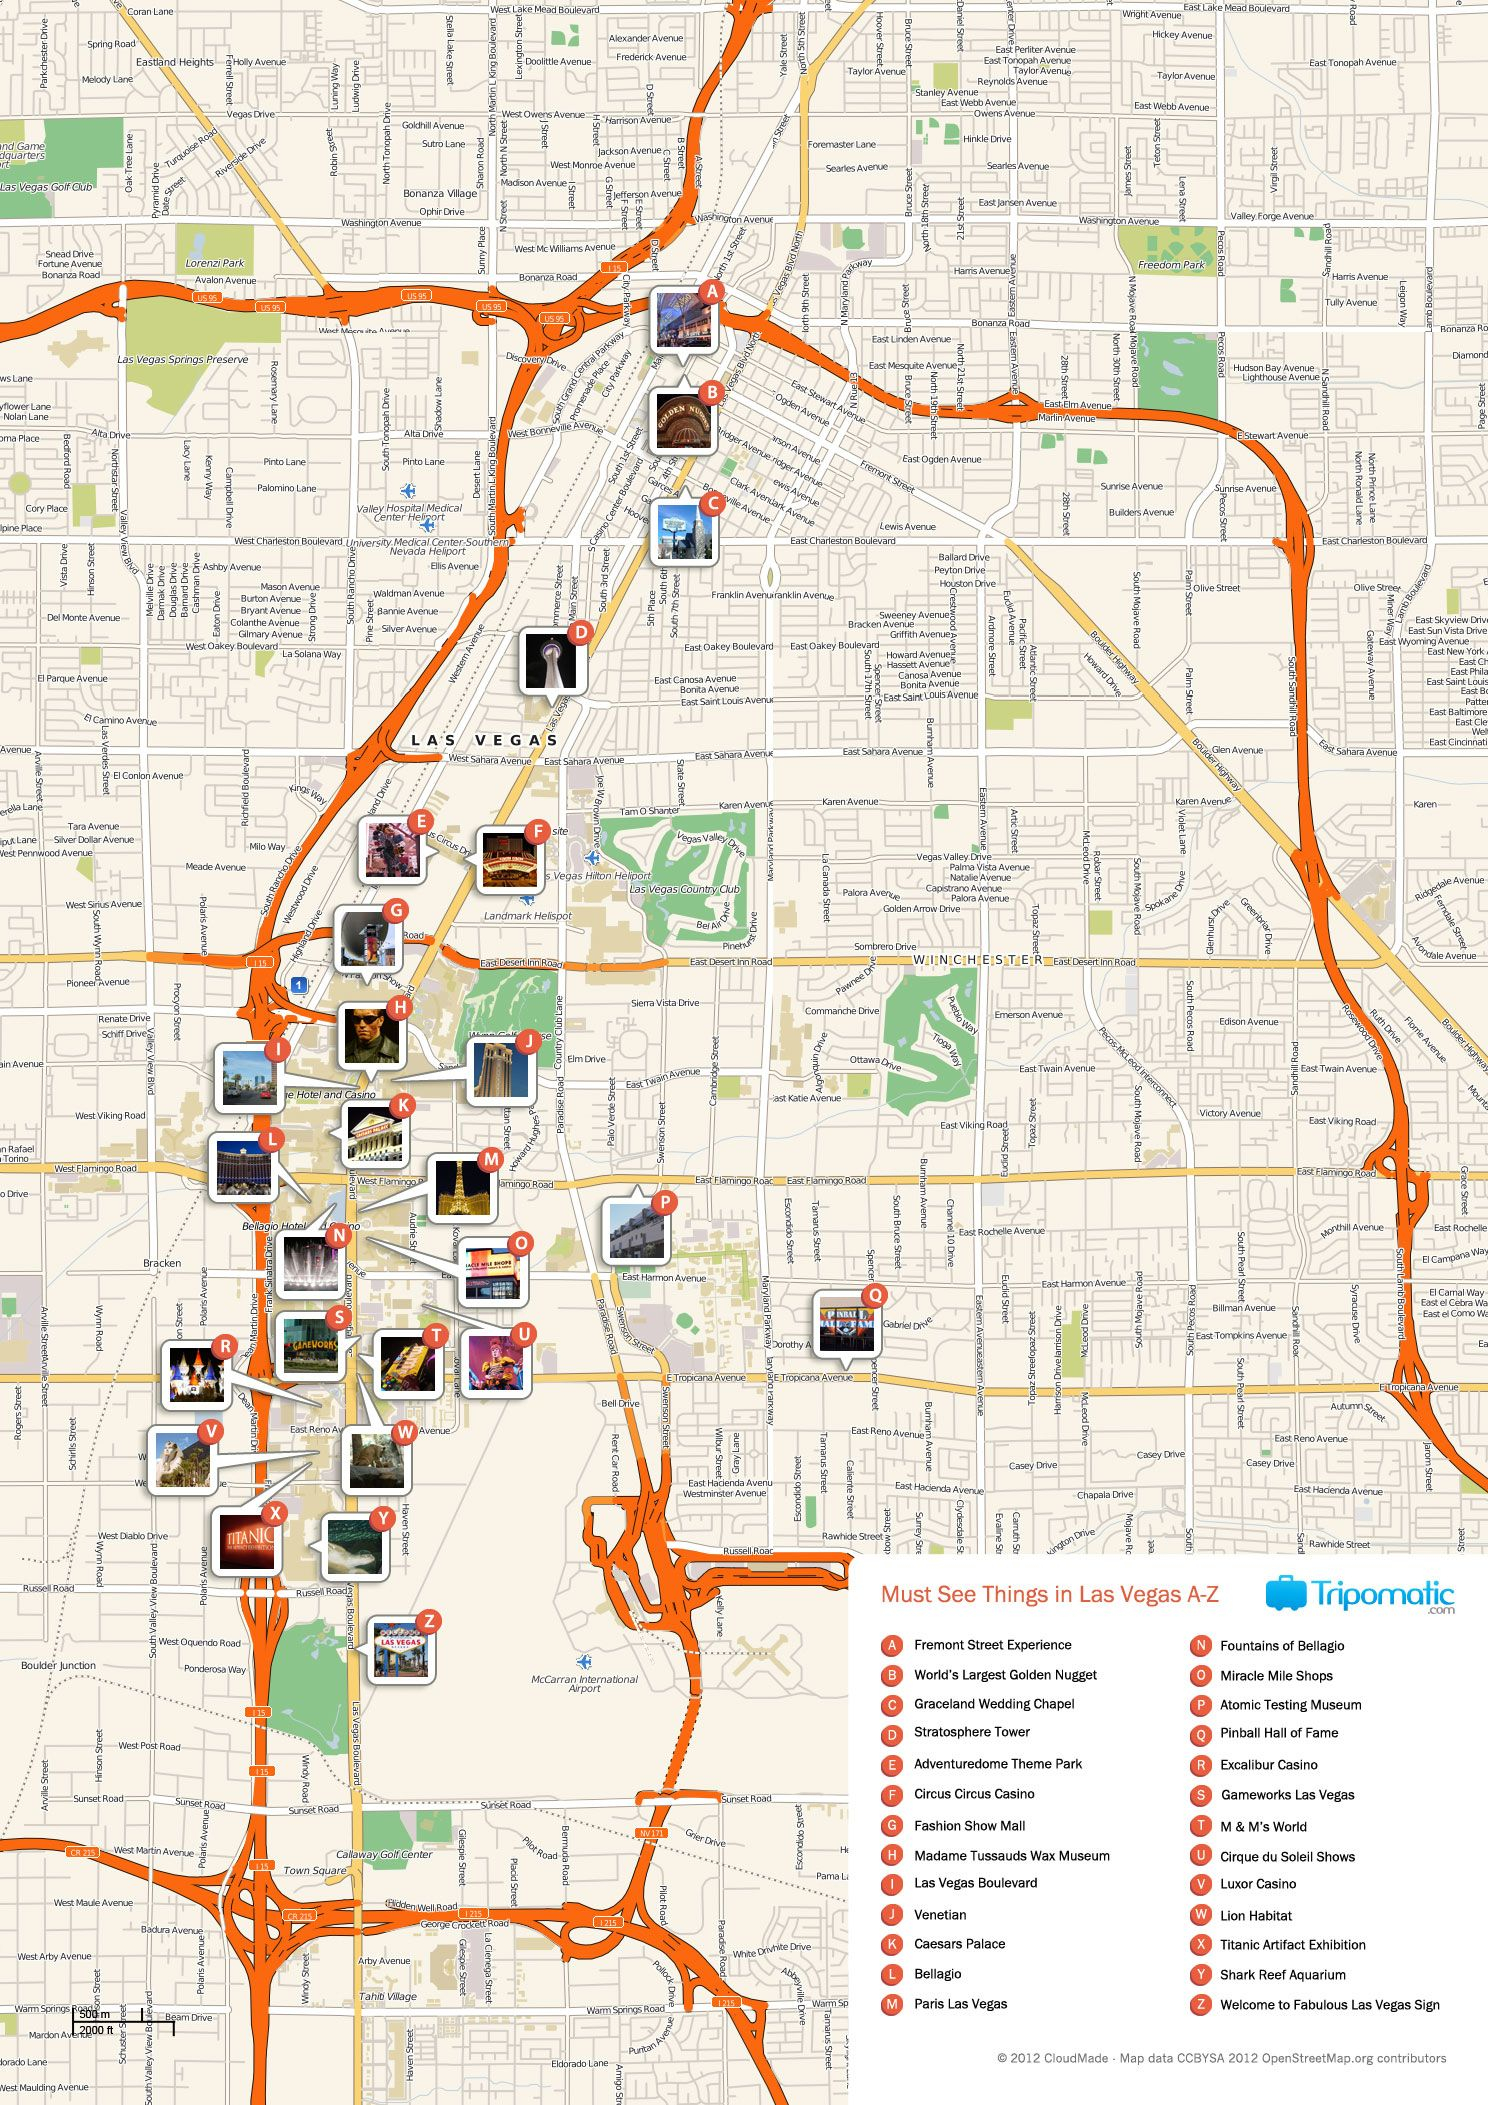 Free Printable Map Of Las Vegas Attractions Vegas